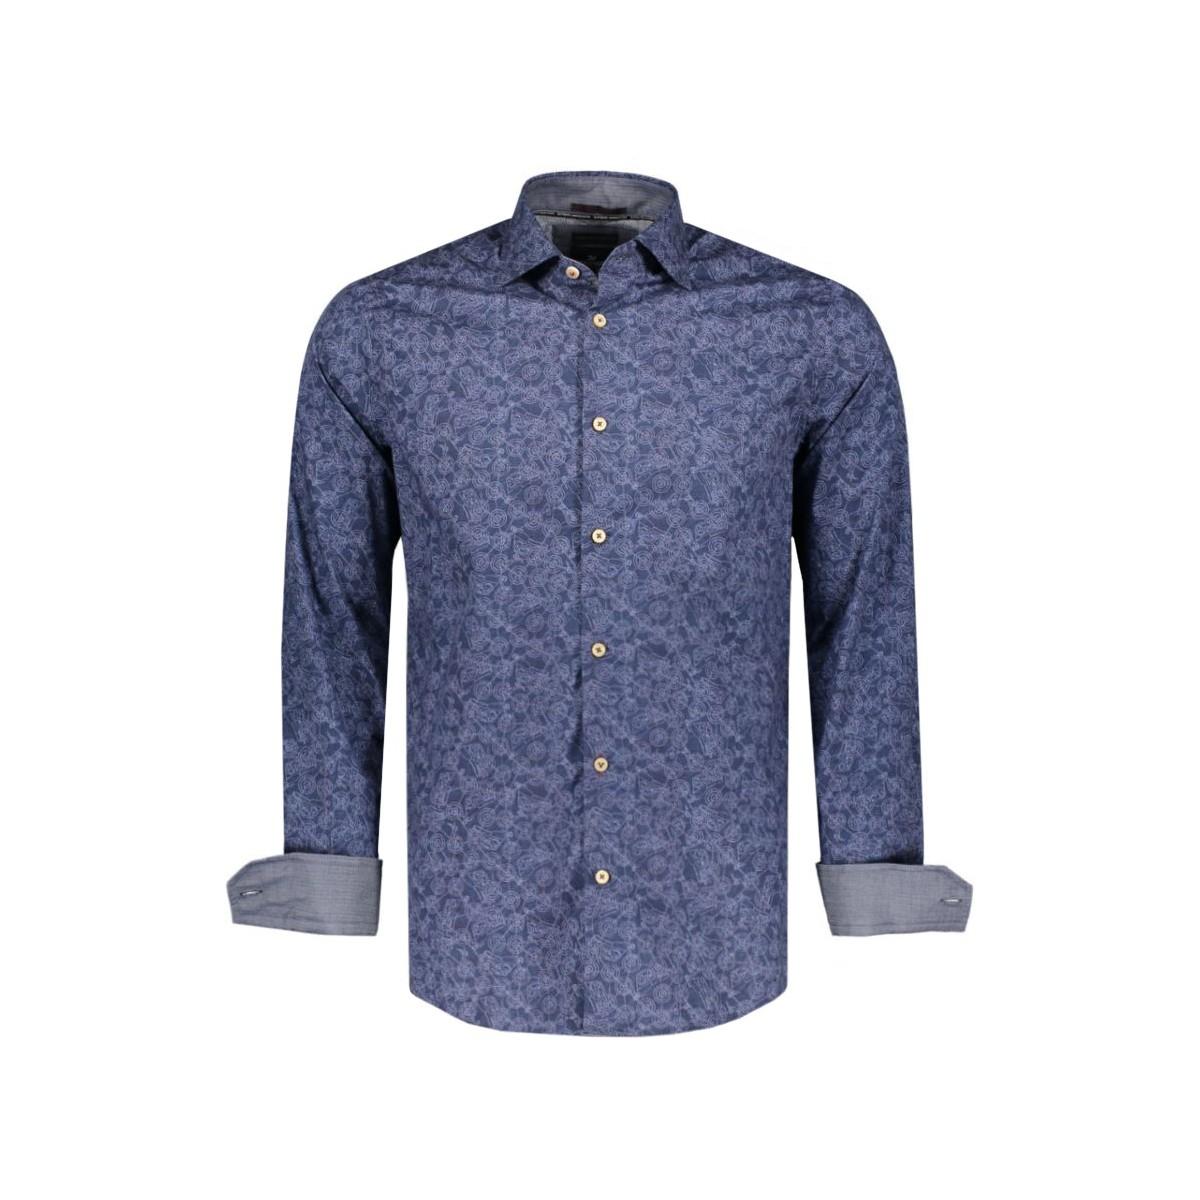 blauw heren overhemd Vanguard VSI66417-5883